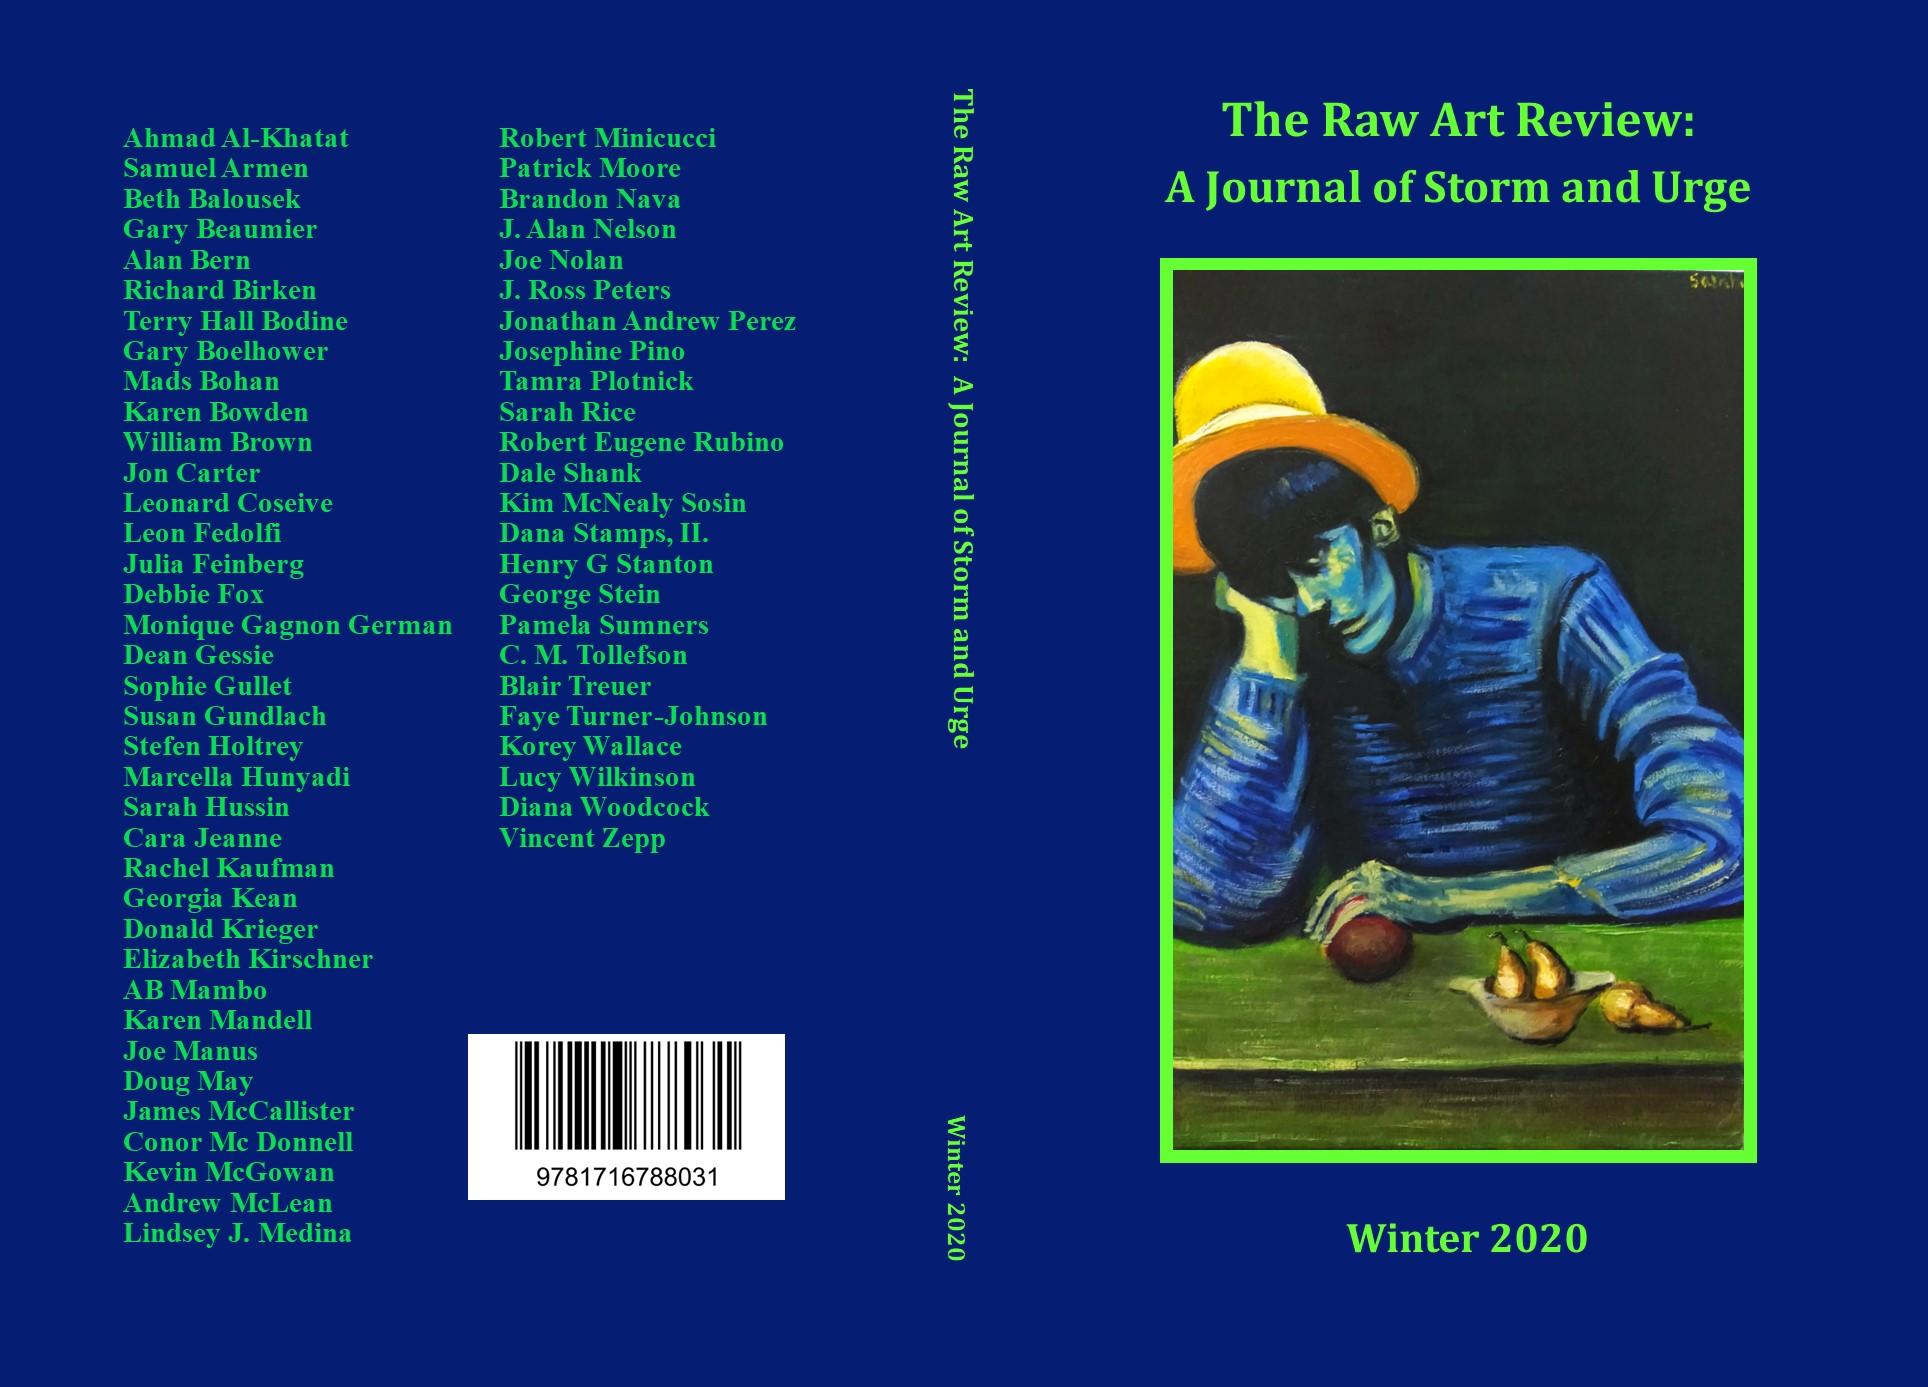 RAR 2020 WINTER COVERS GALLEY 20200708 001